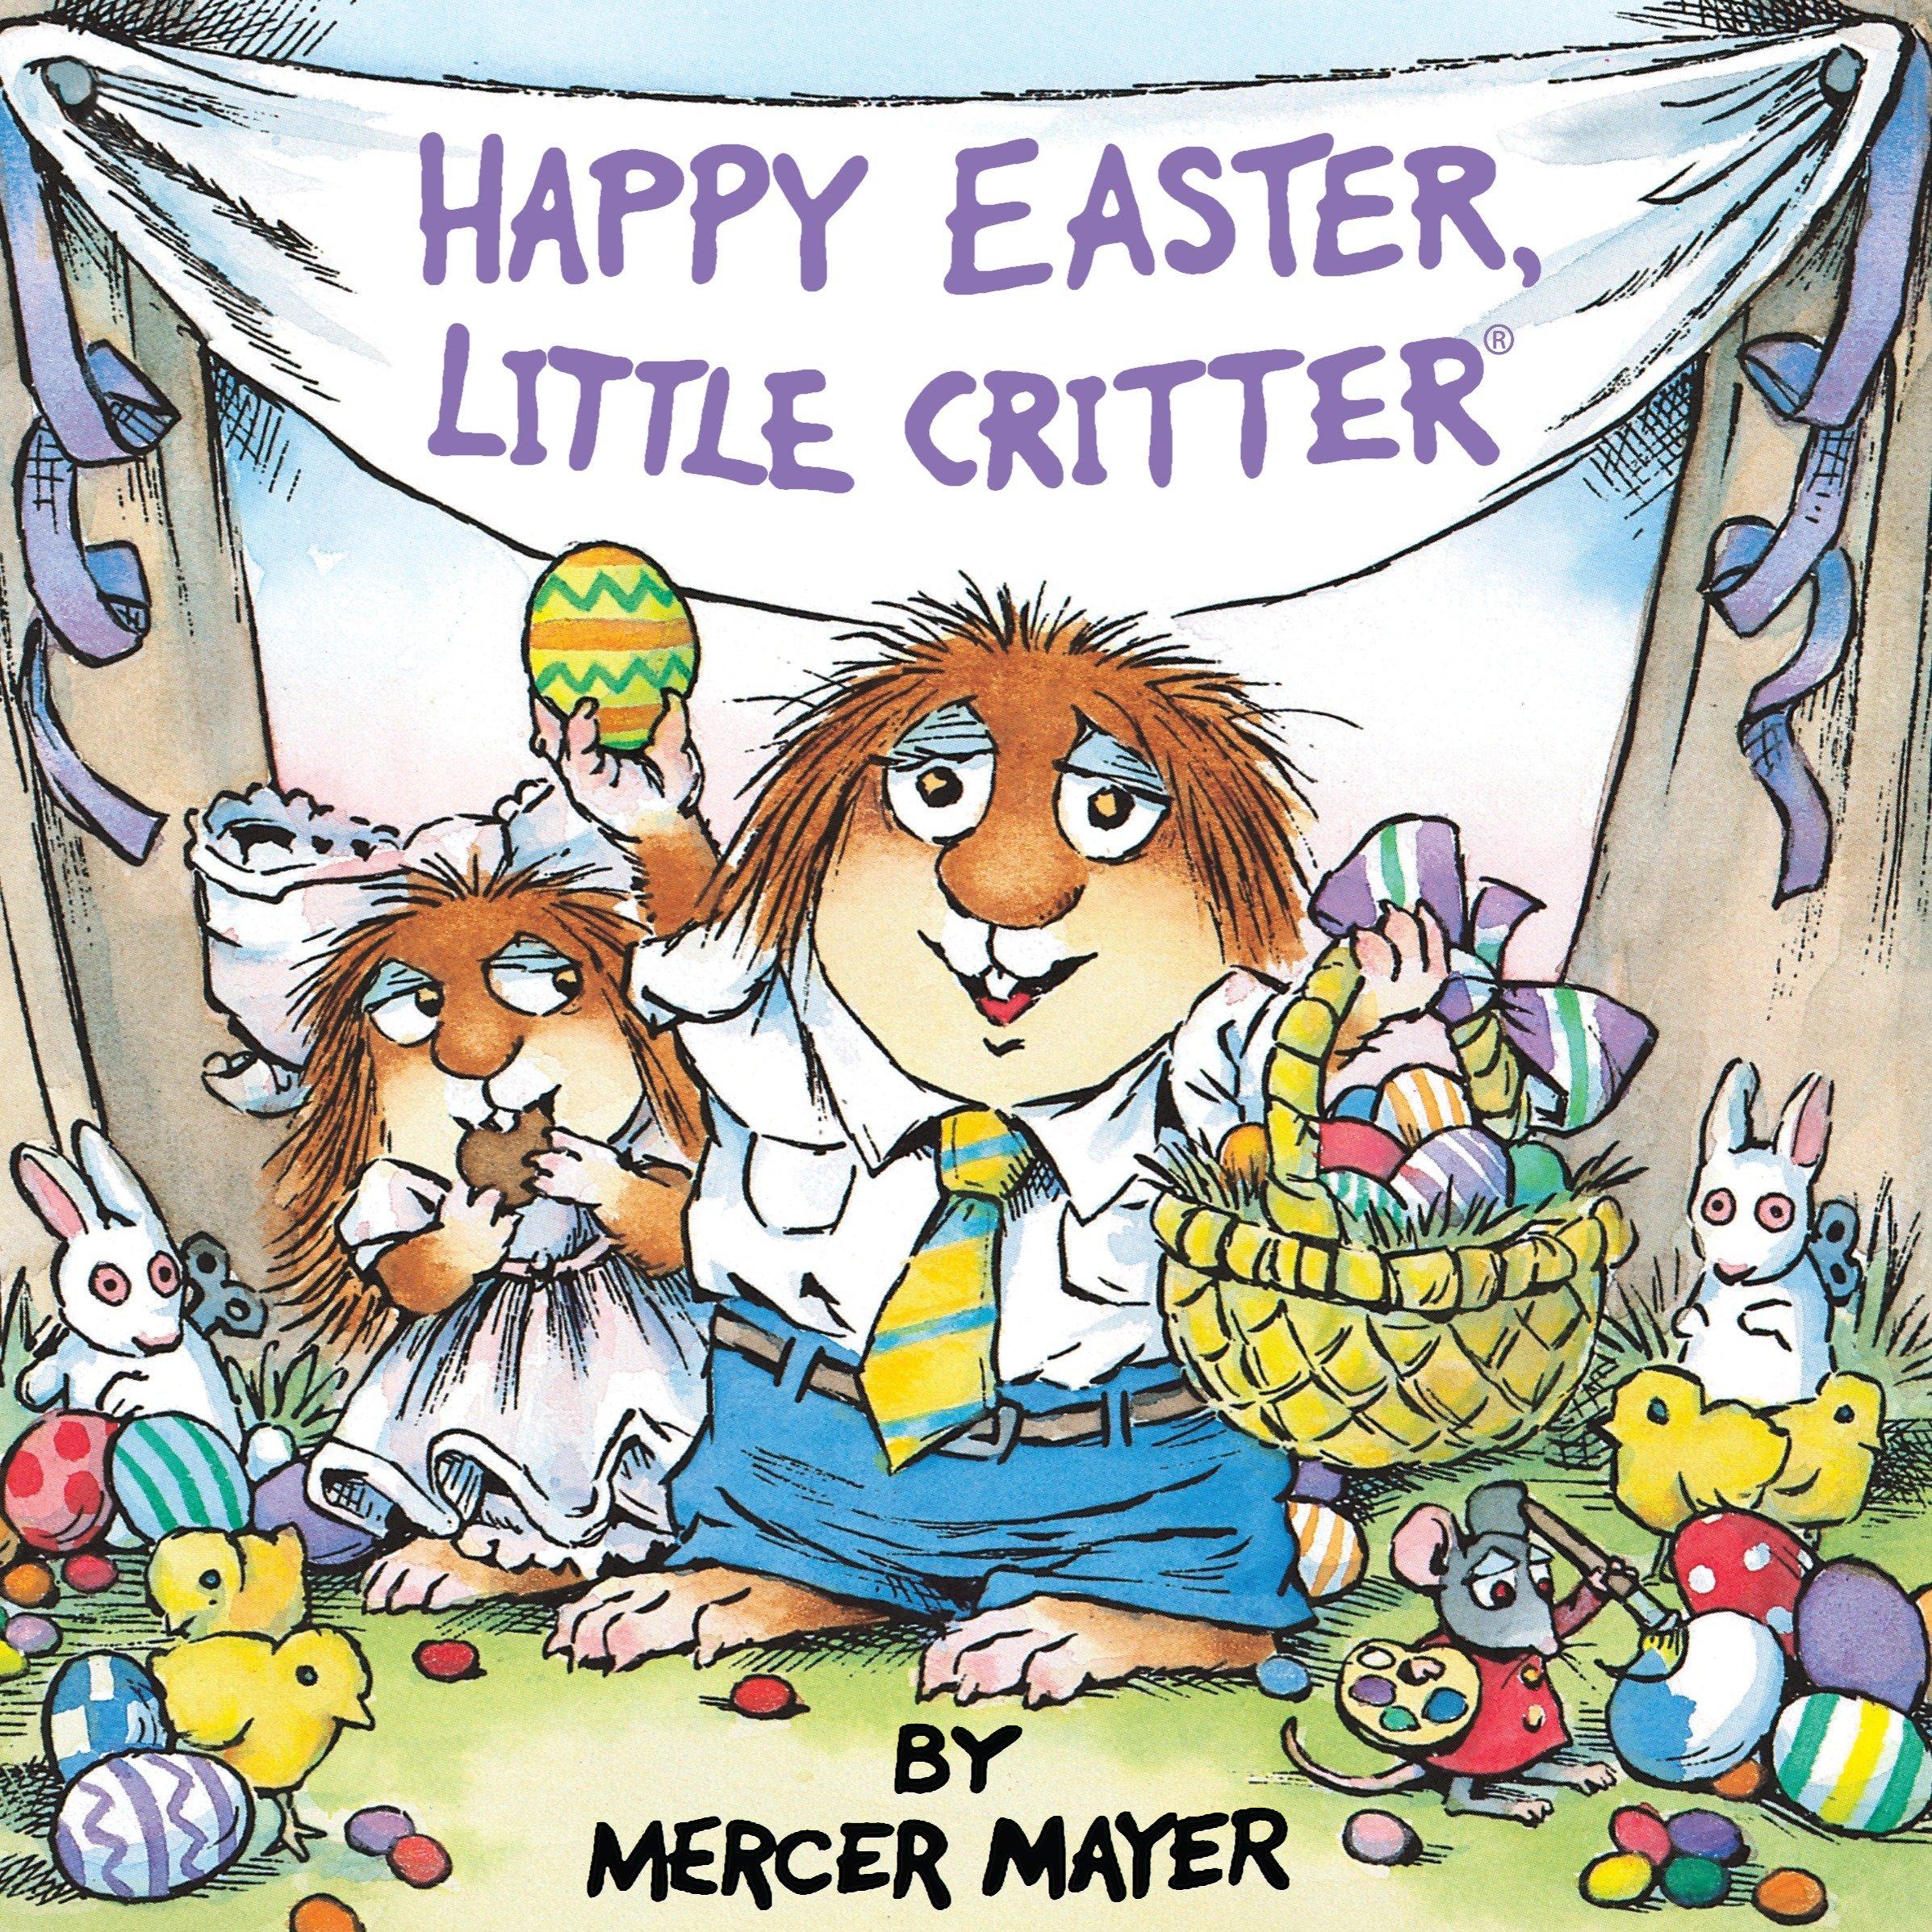 Happy Easter, Little Critter (Little Critter) (Look-Look): Mercer Mayer:  0033500117237: Amazon.com: Books